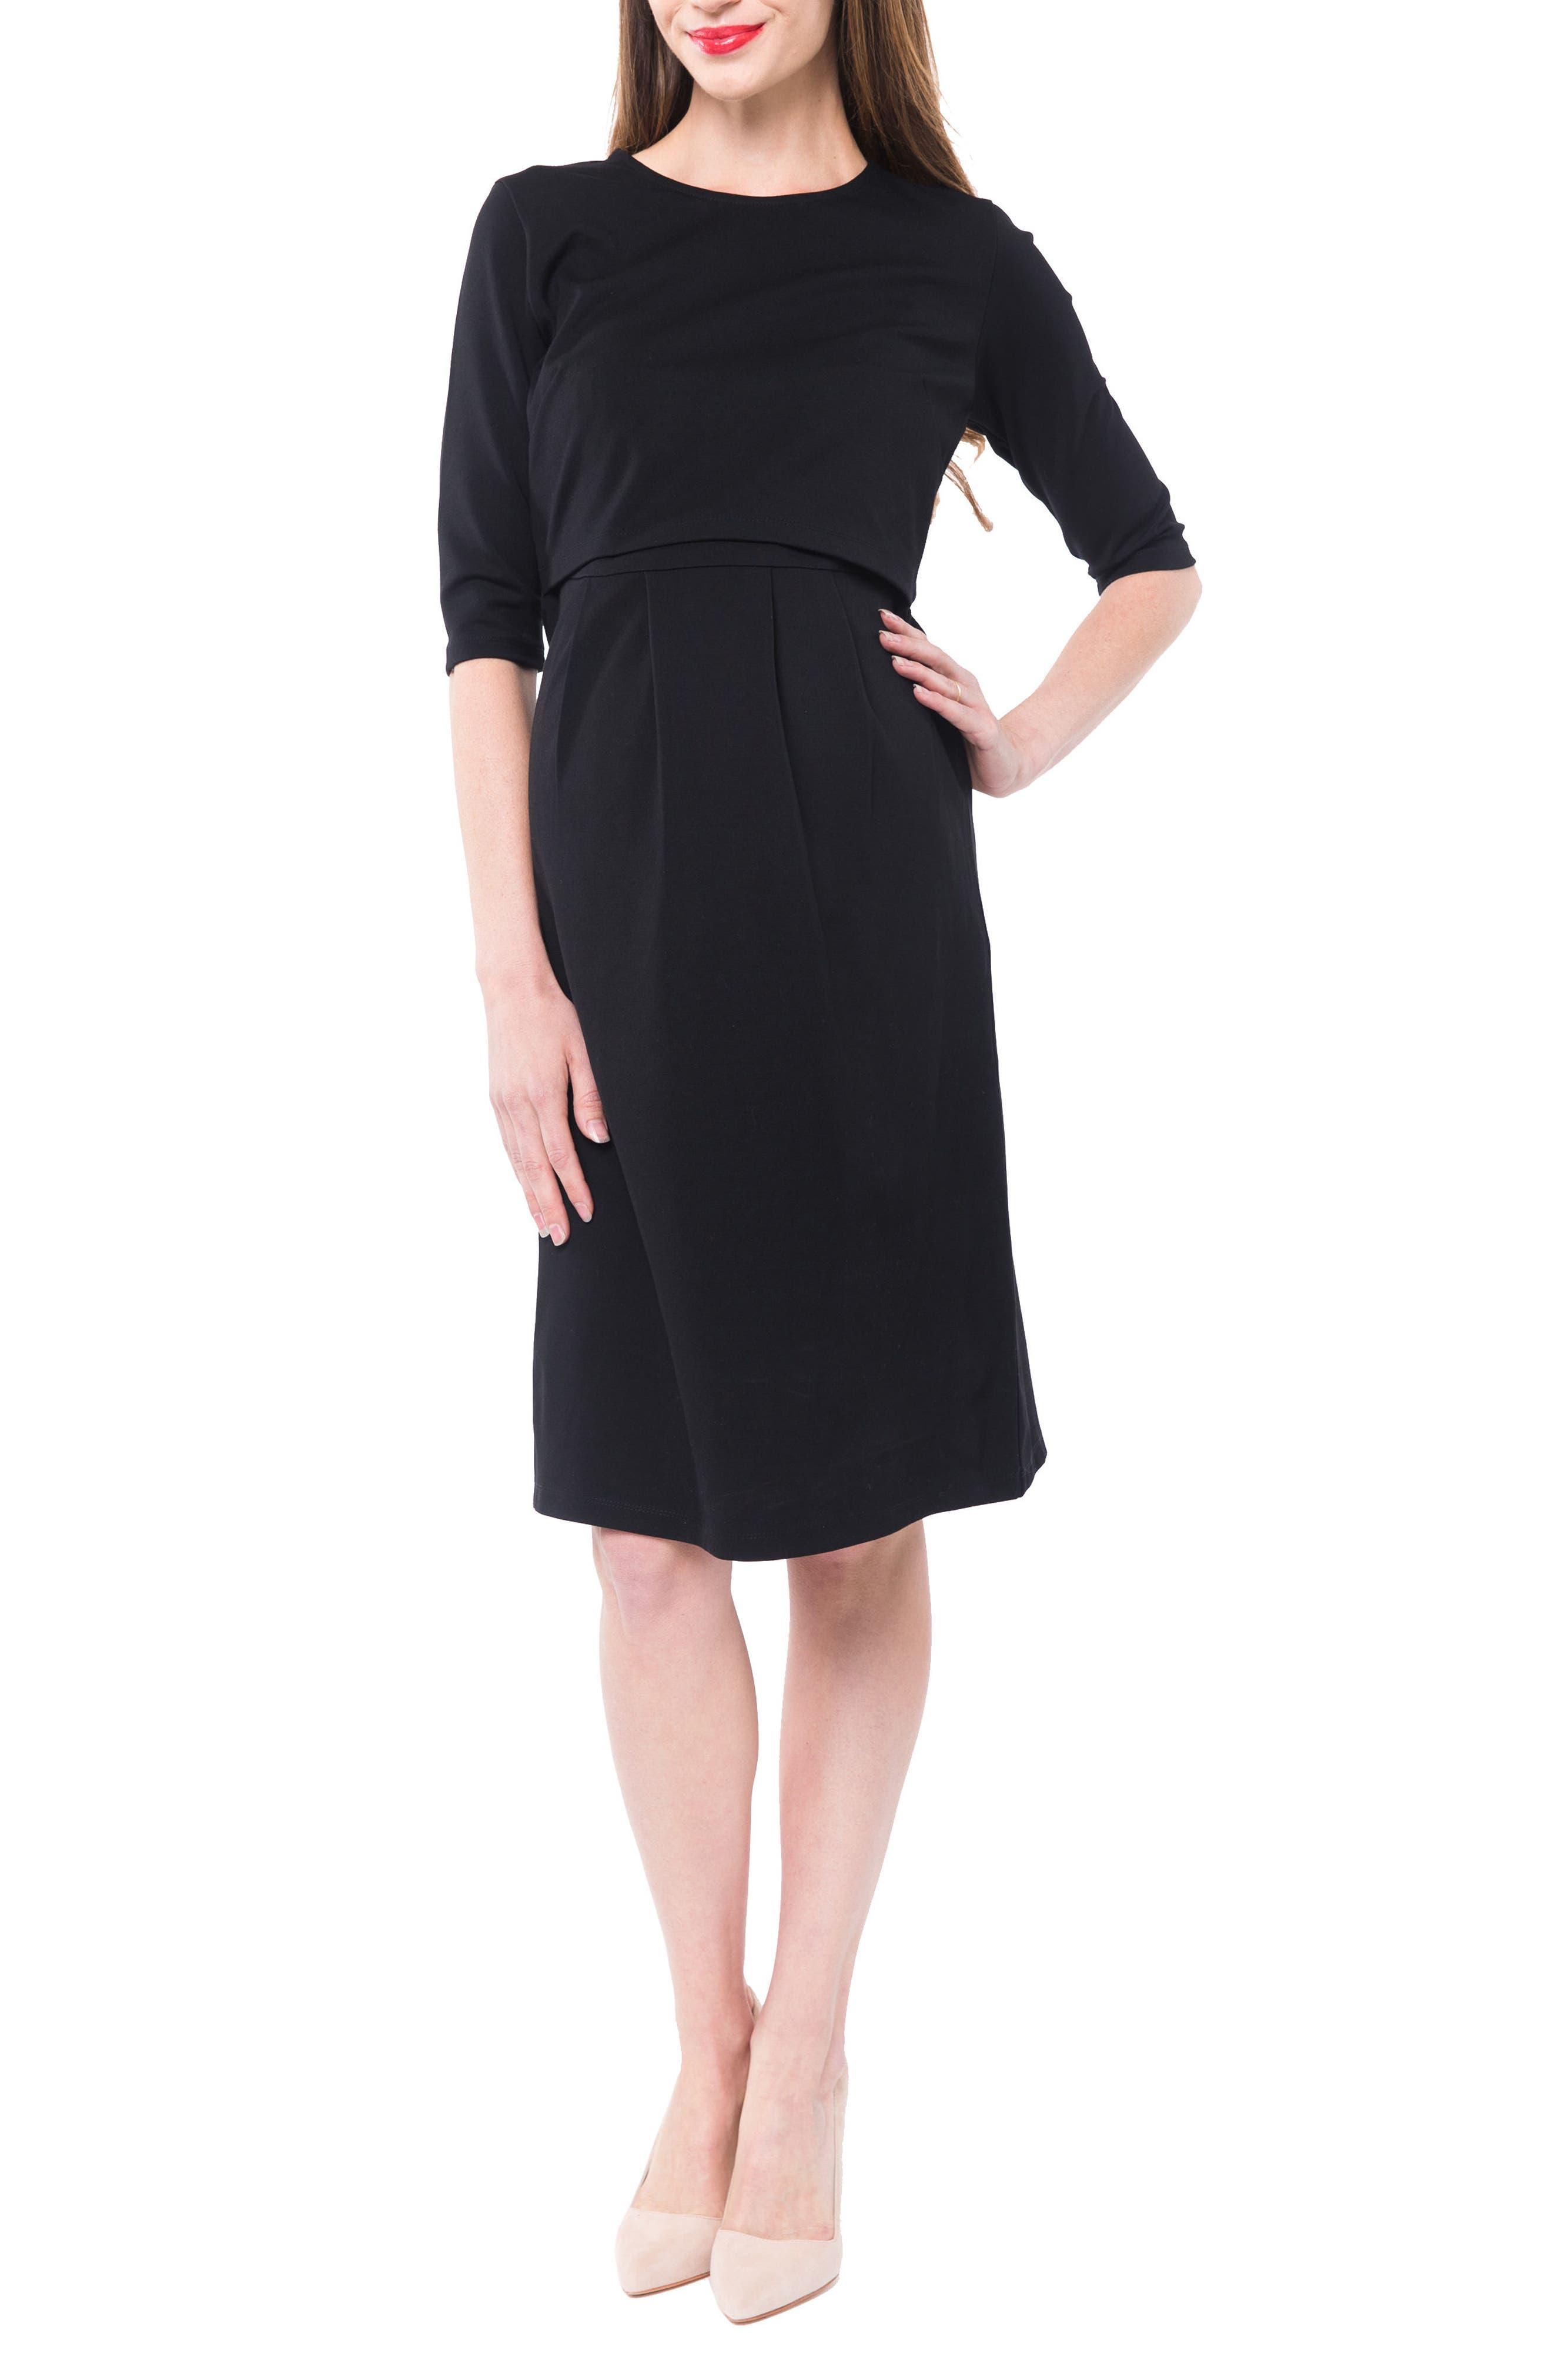 Valentina Ponté Knit Maternity/Nursing Dress,                         Main,                         color, BLACK